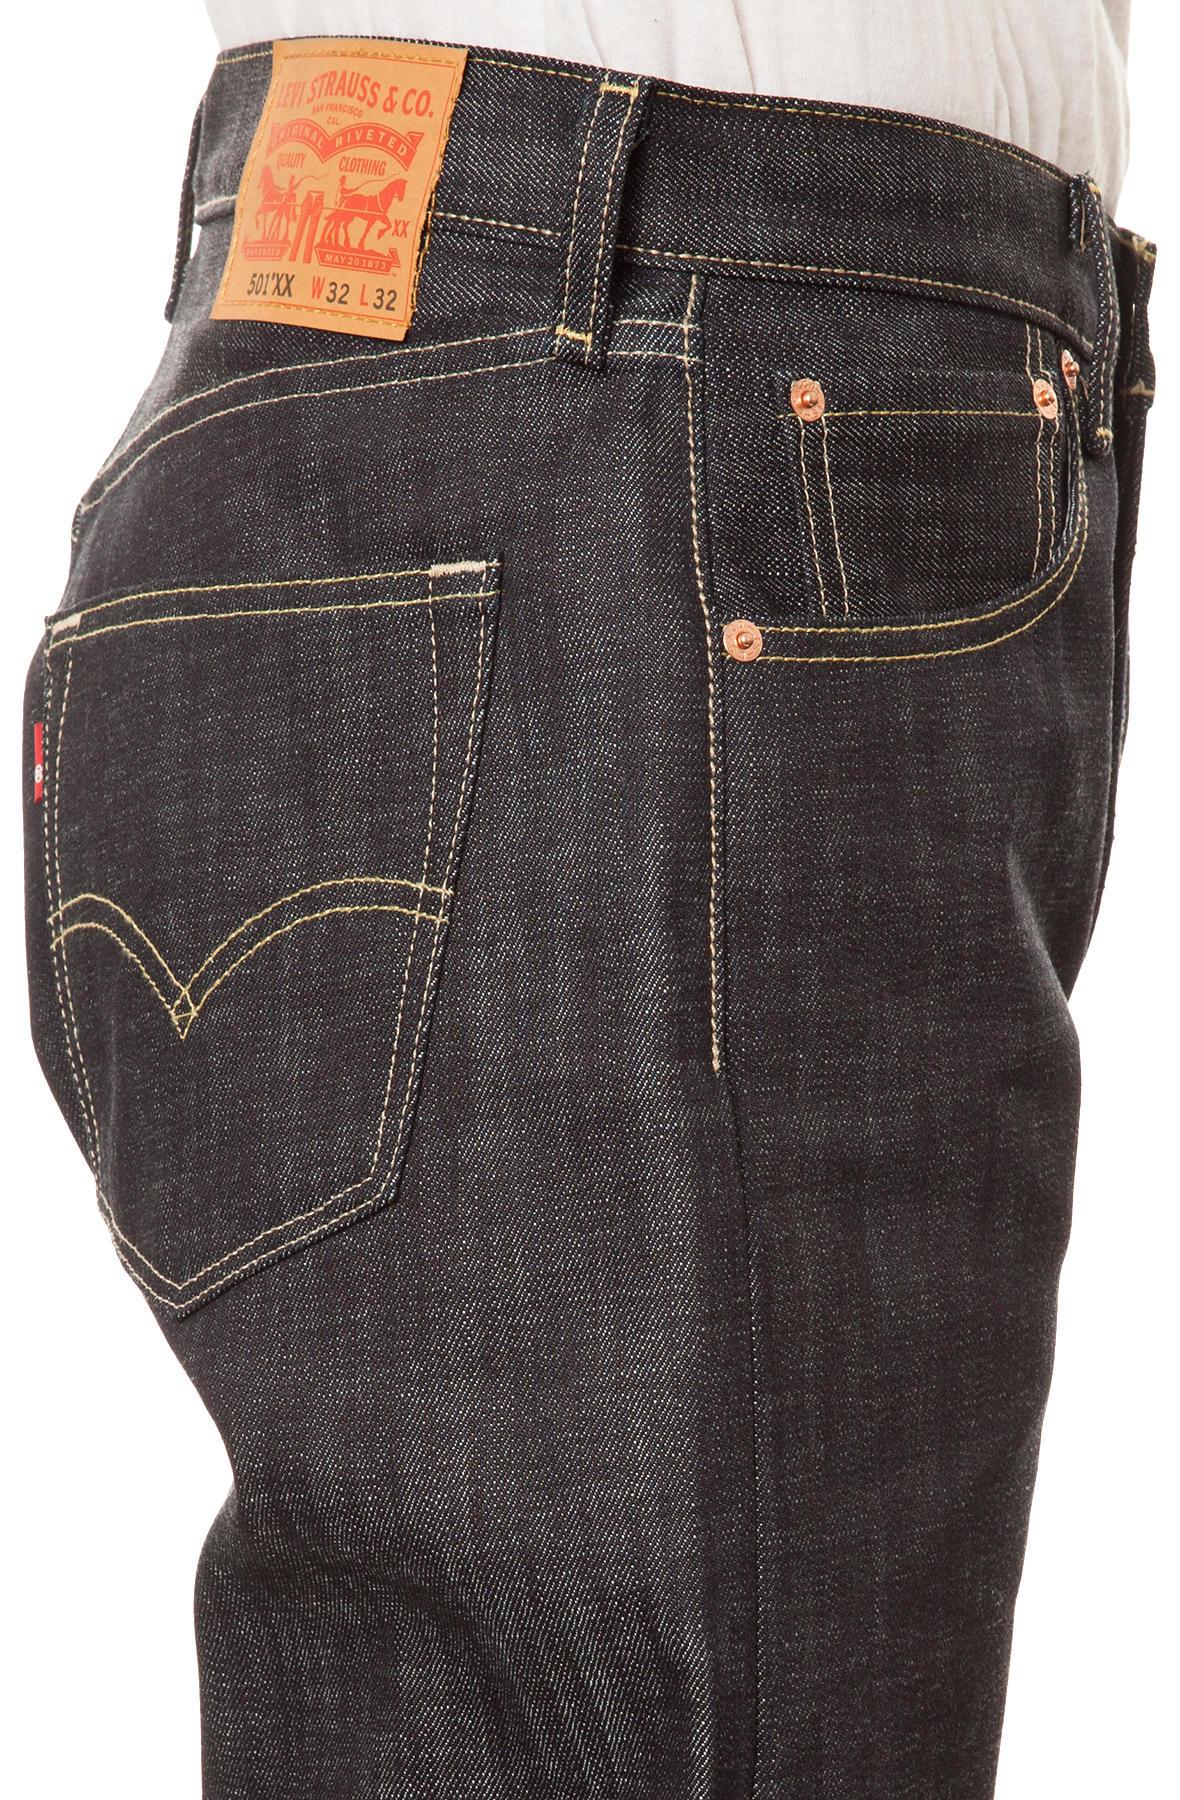 Lyst - Levi'S Men's 501 Original Fit Jeans in Black for Men